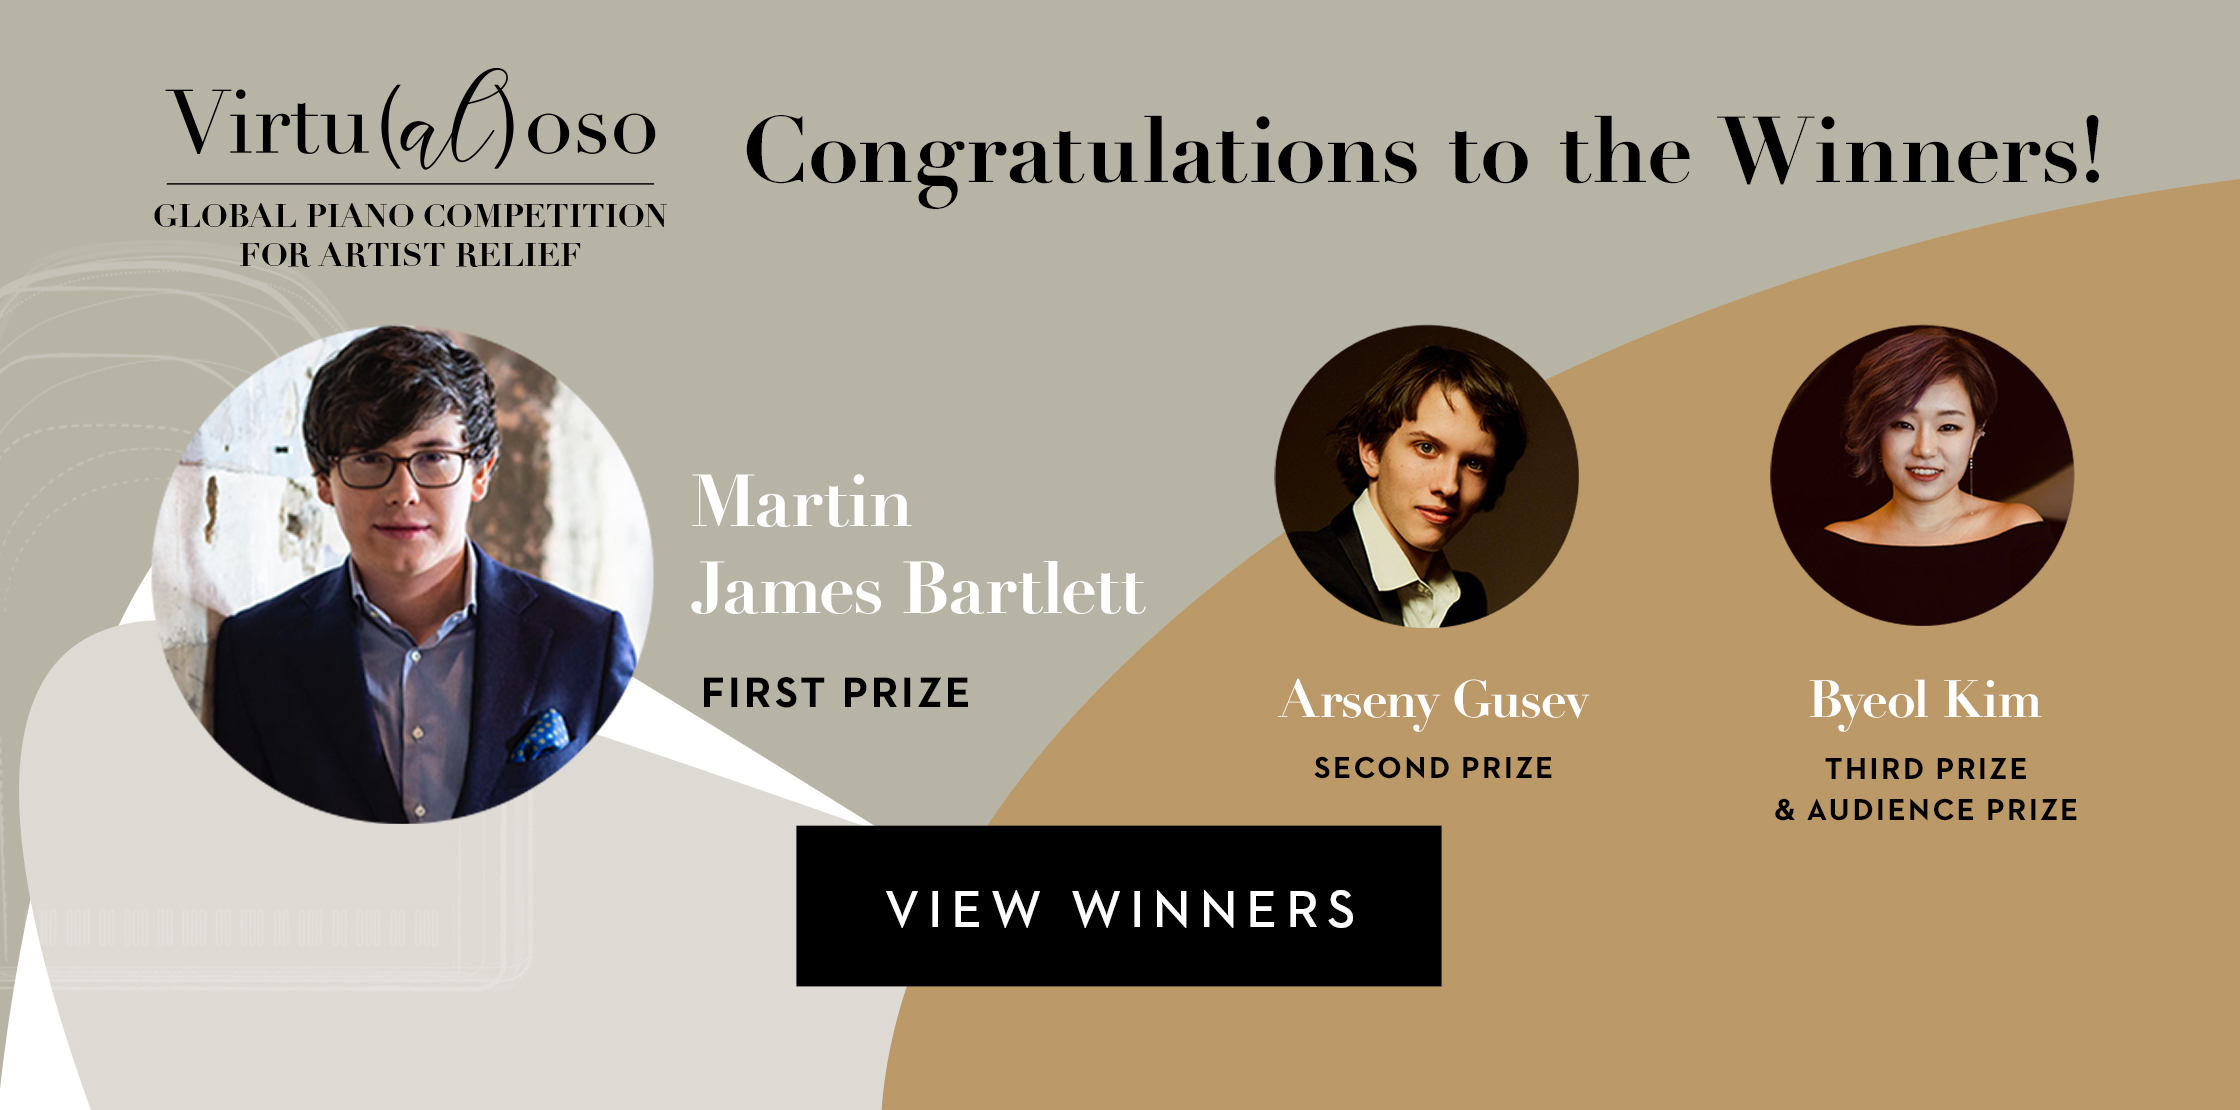 Virtualoso winners' announcement